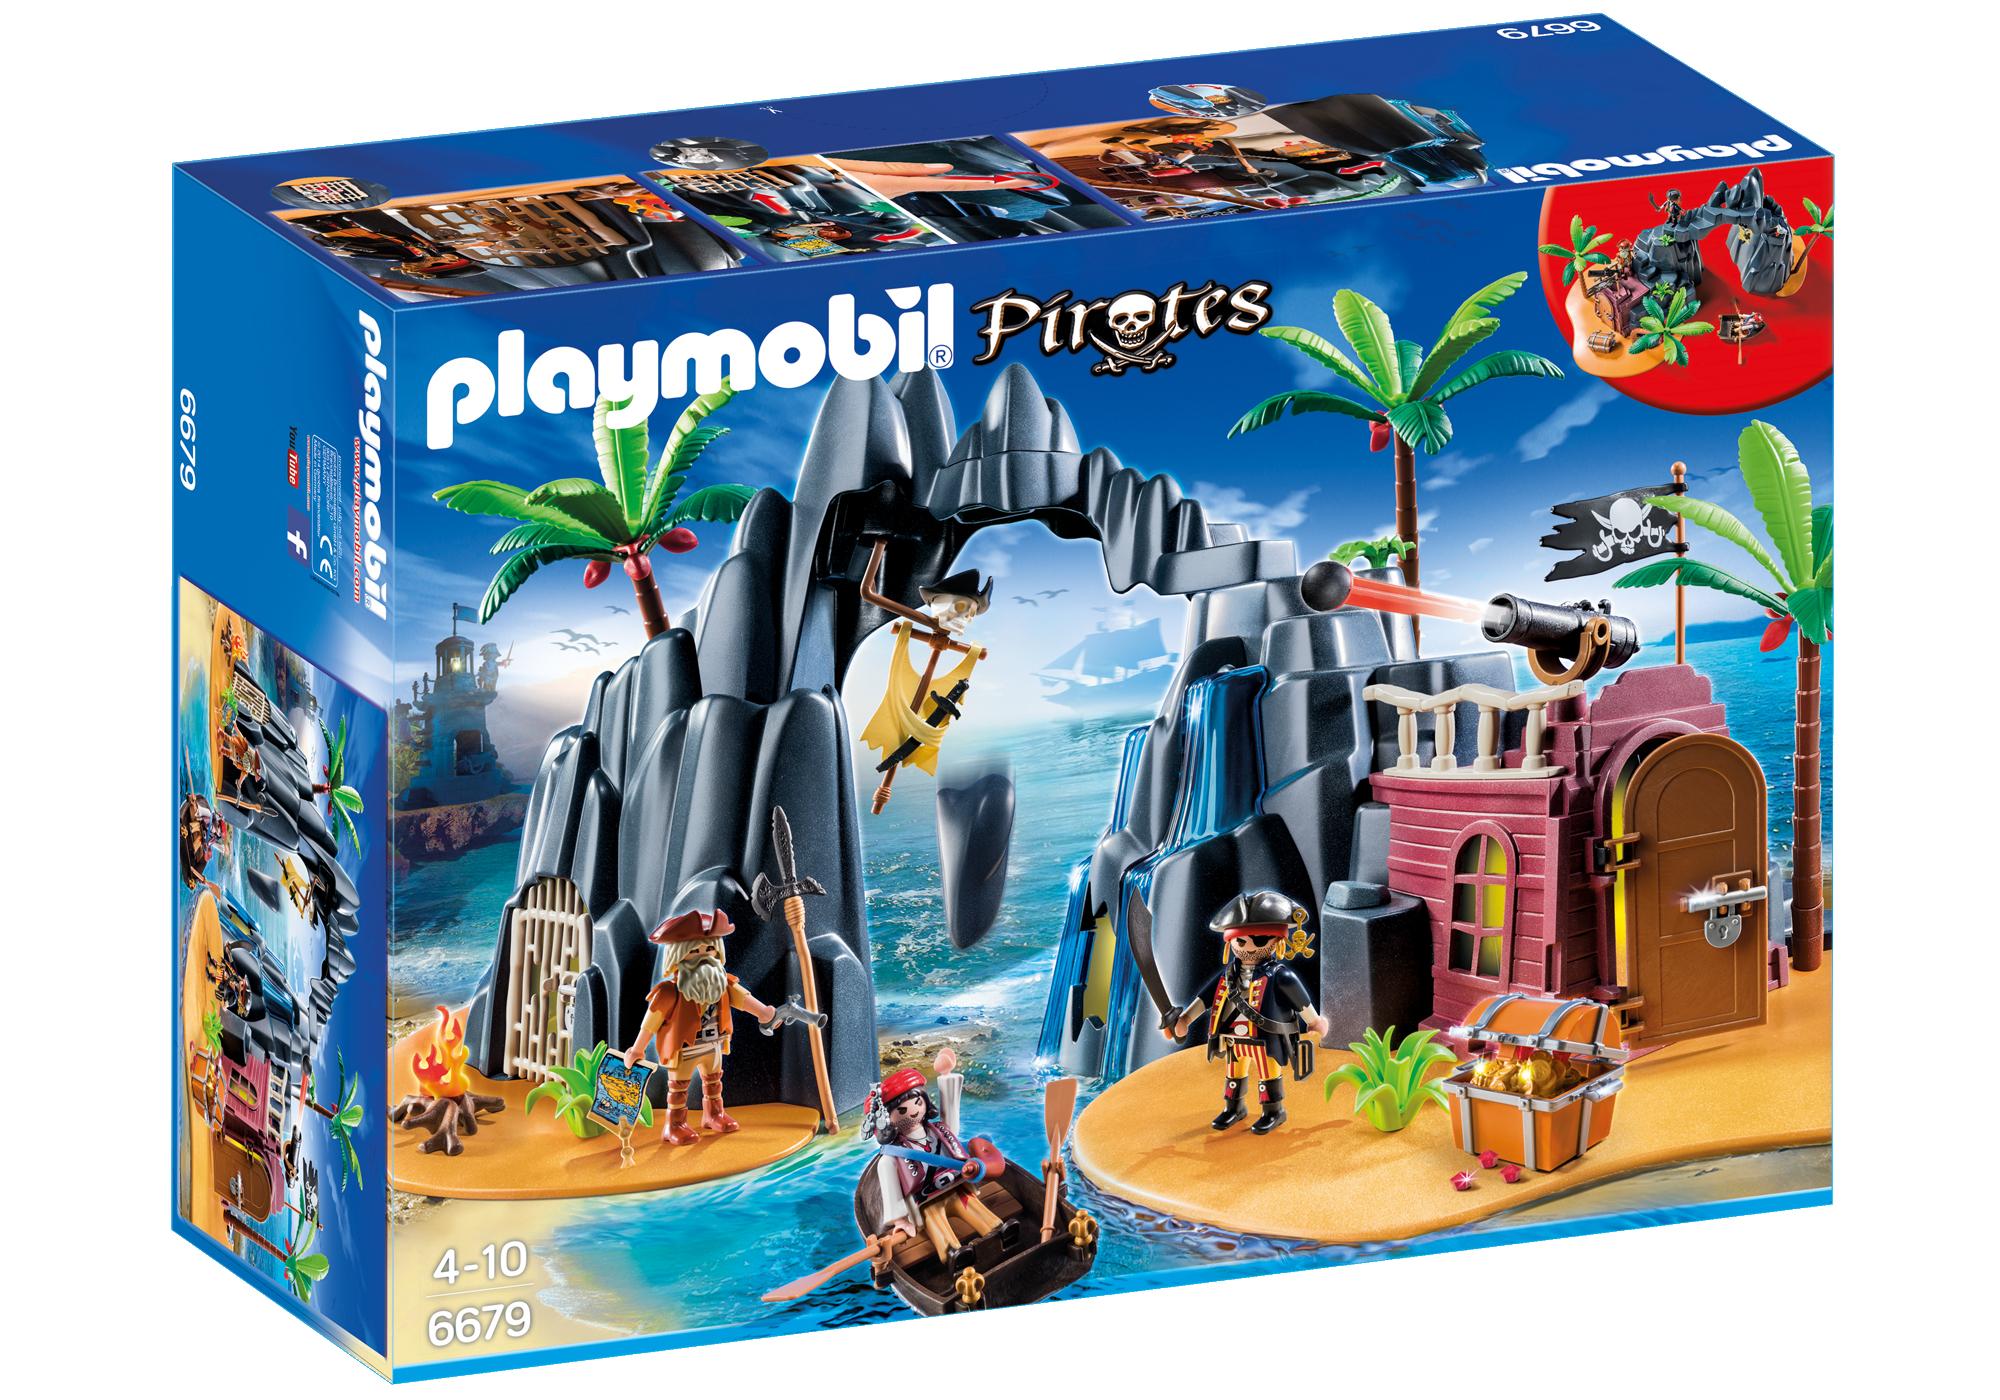 http://media.playmobil.com/i/playmobil/6679_product_box_front/Pirate Treasure Island